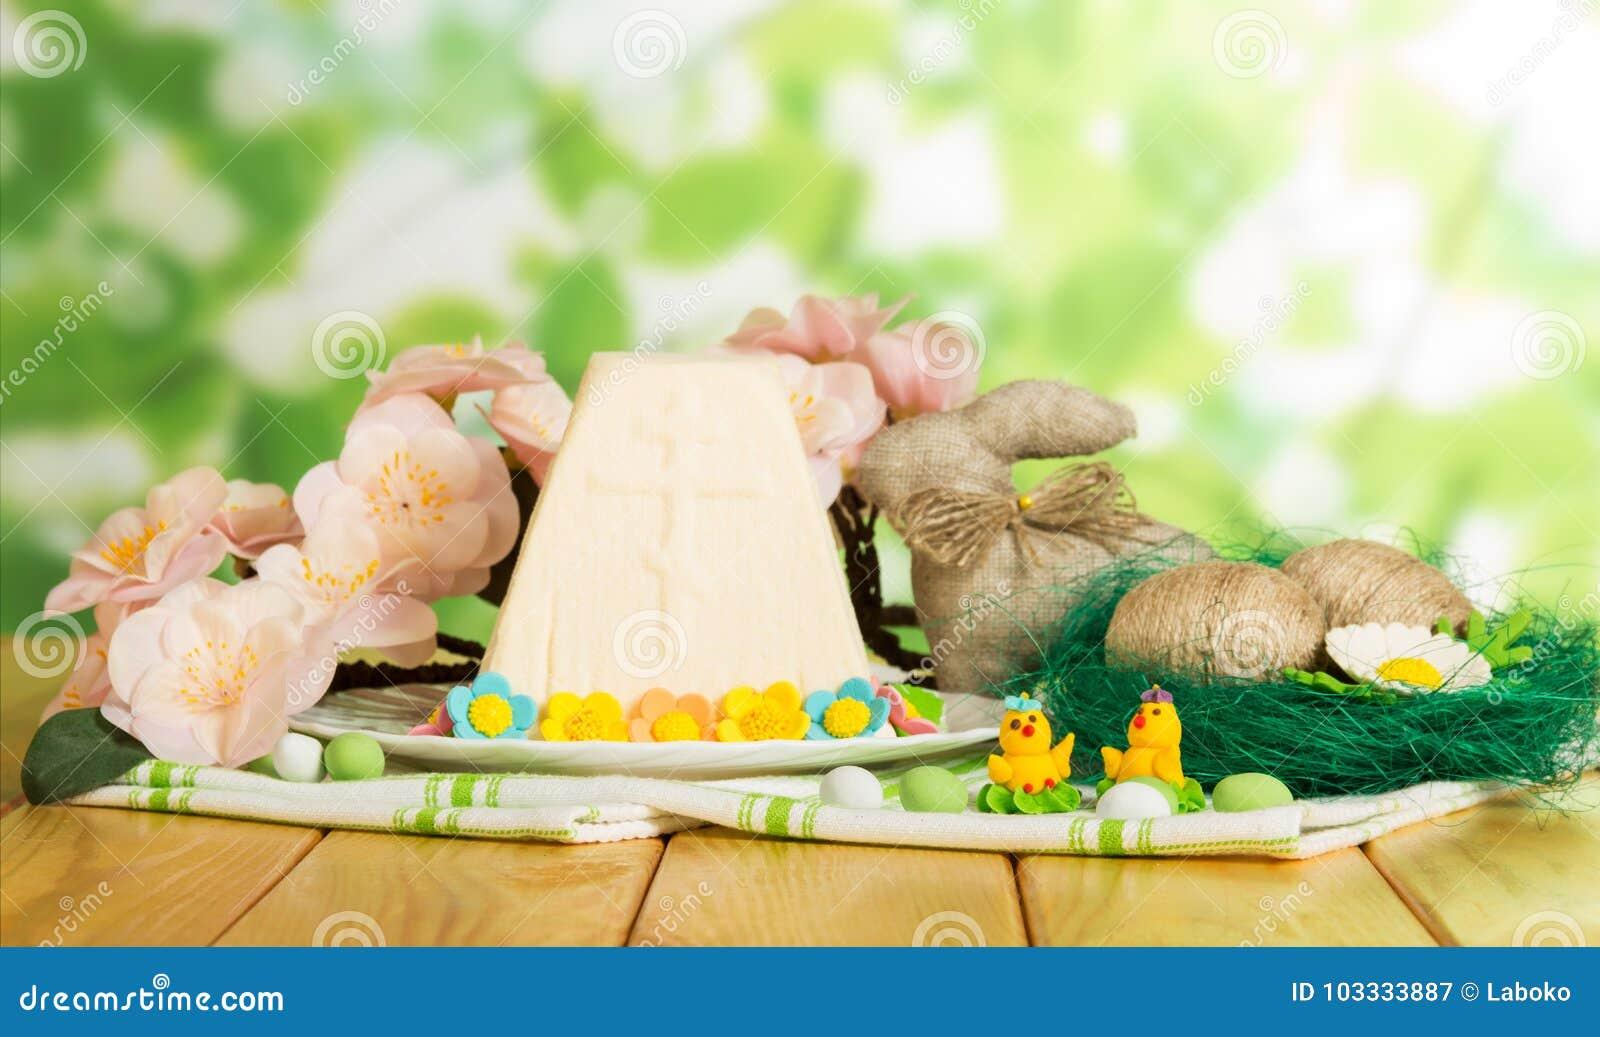 Postre tradicional del queso de Pascua, huevos de Pascua, conejito, polluelo del juguete